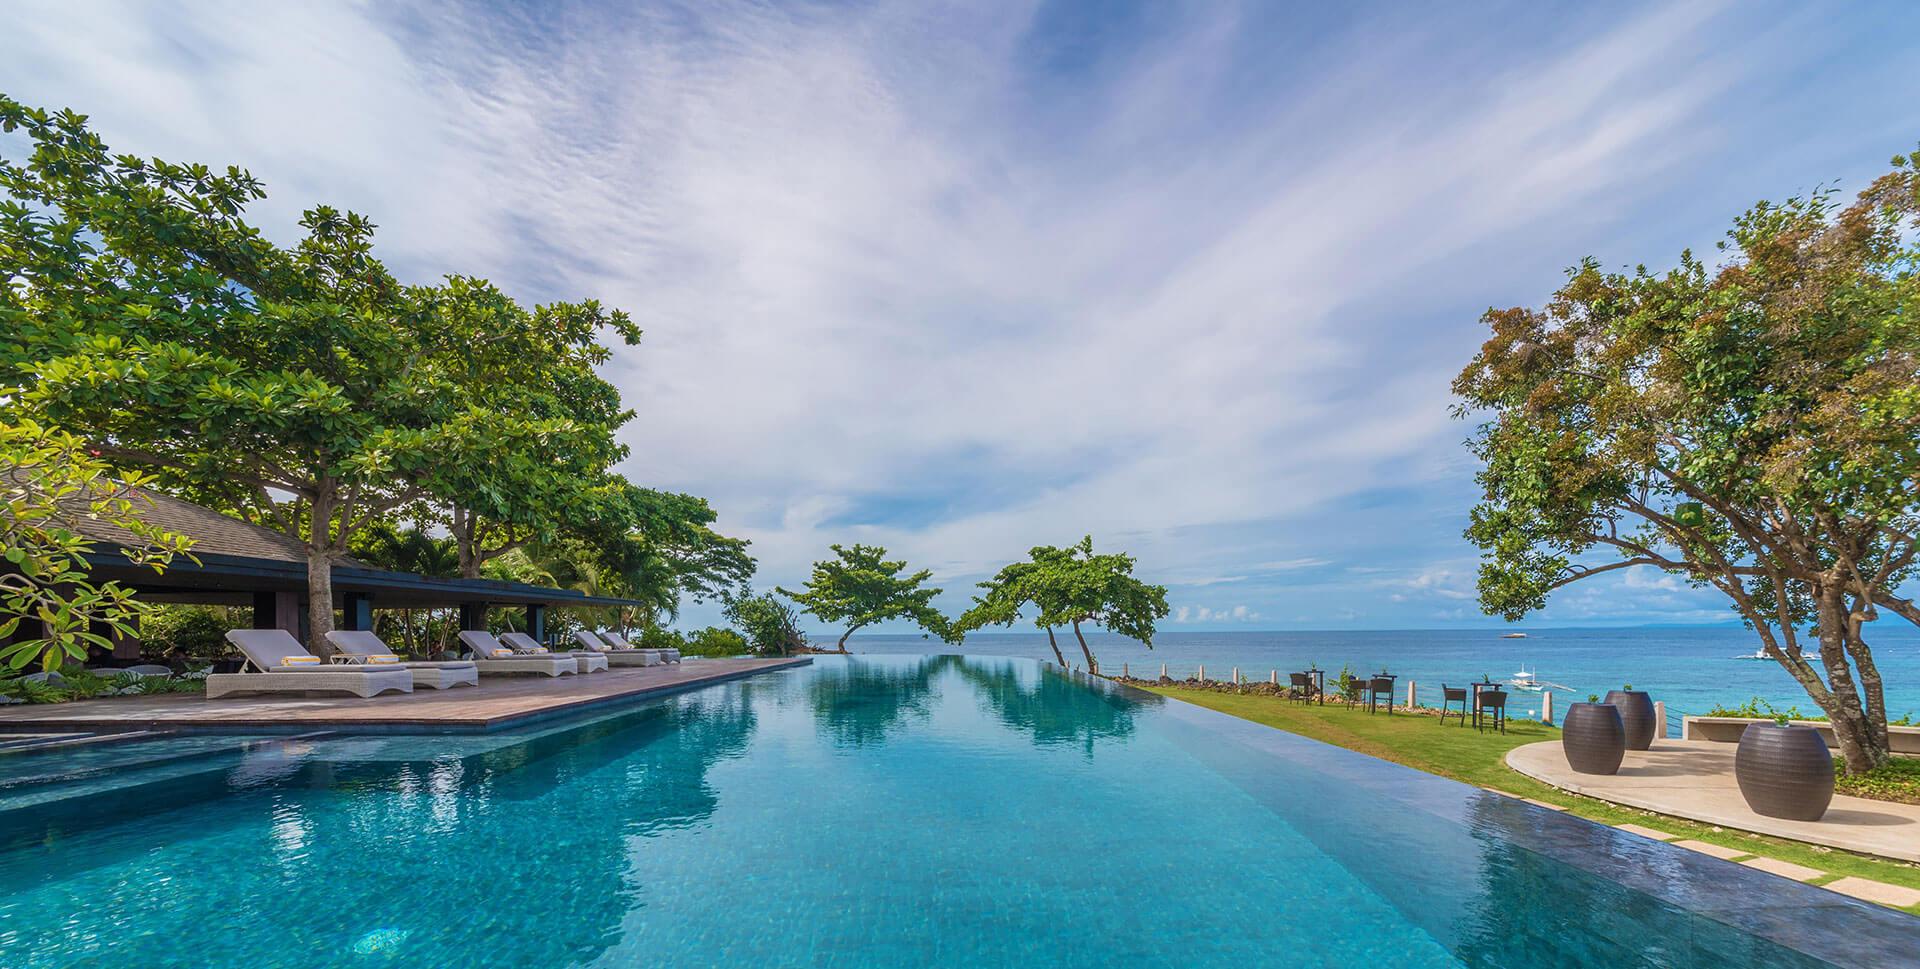 Blue waters of Amorita Resort's inifinity pool